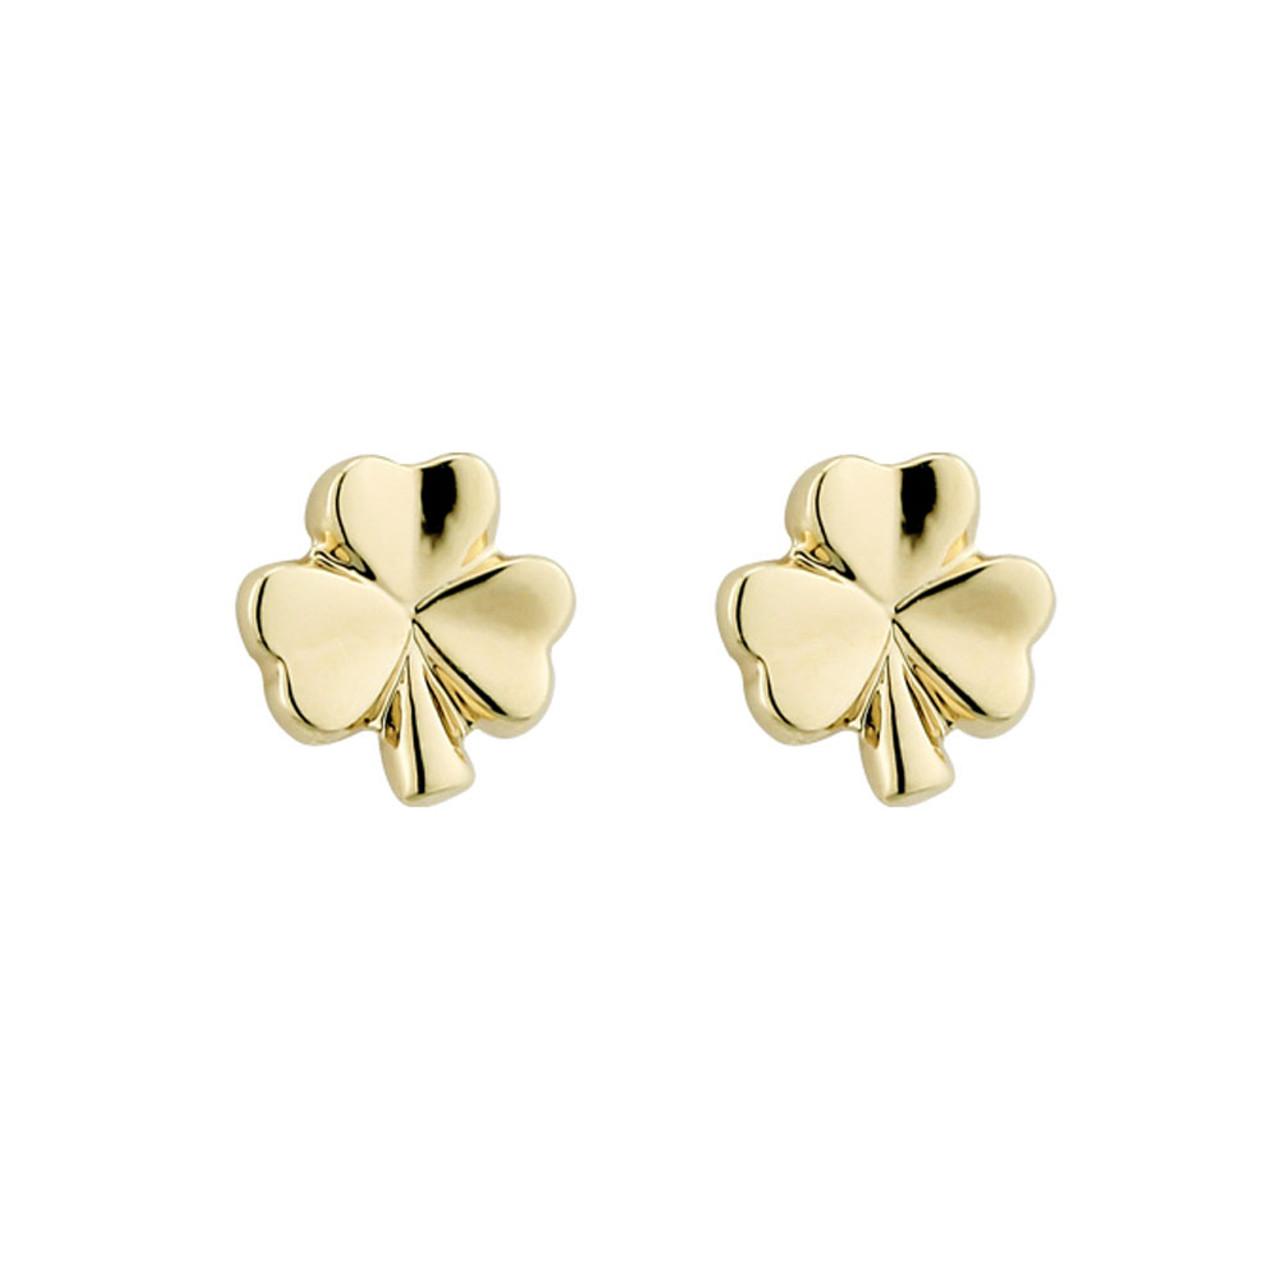 Gold Plated Shamrock Stud Earrings